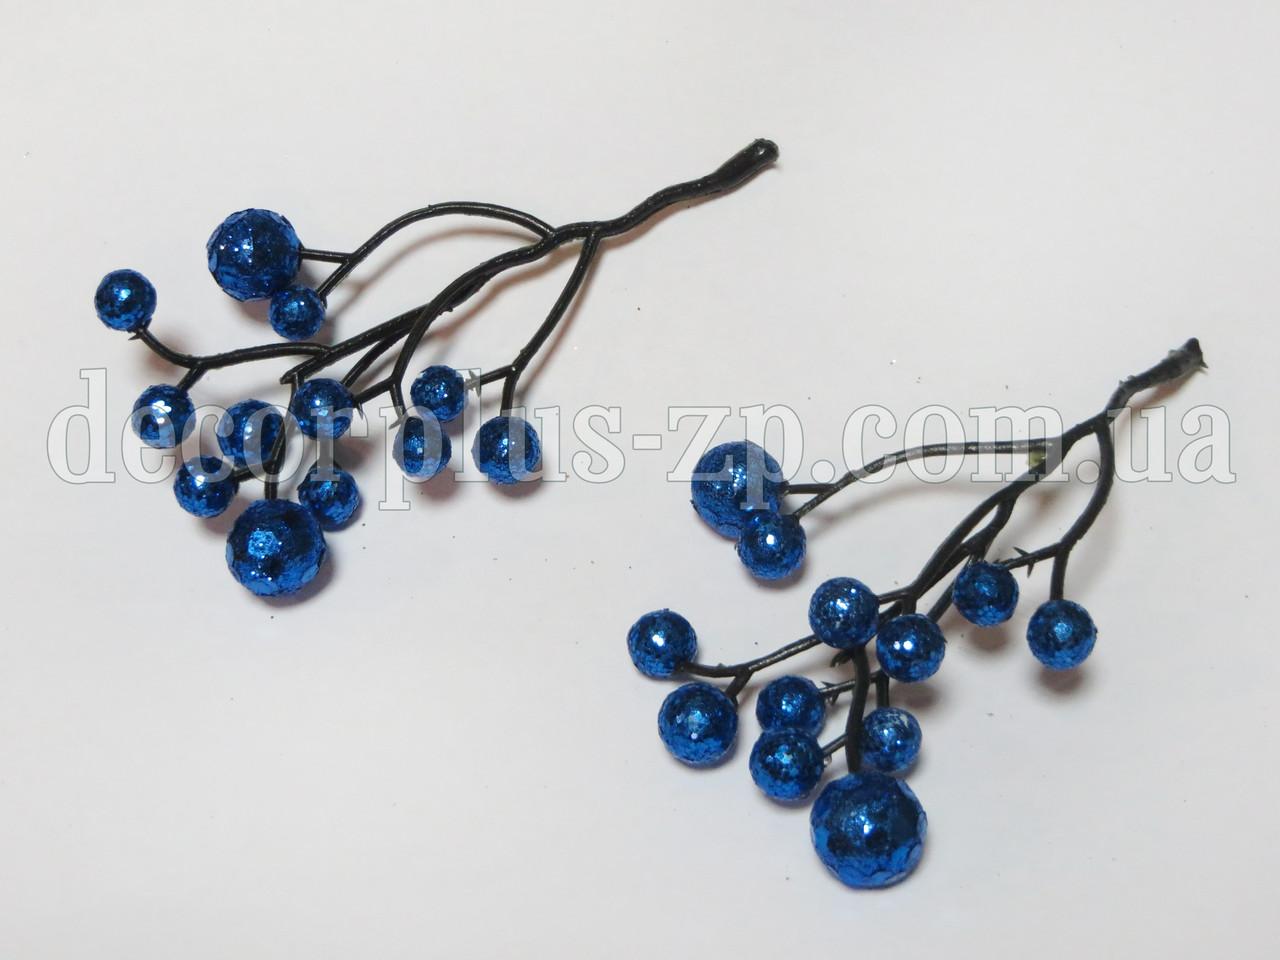 Веточка с ягодками в глиттере, синие